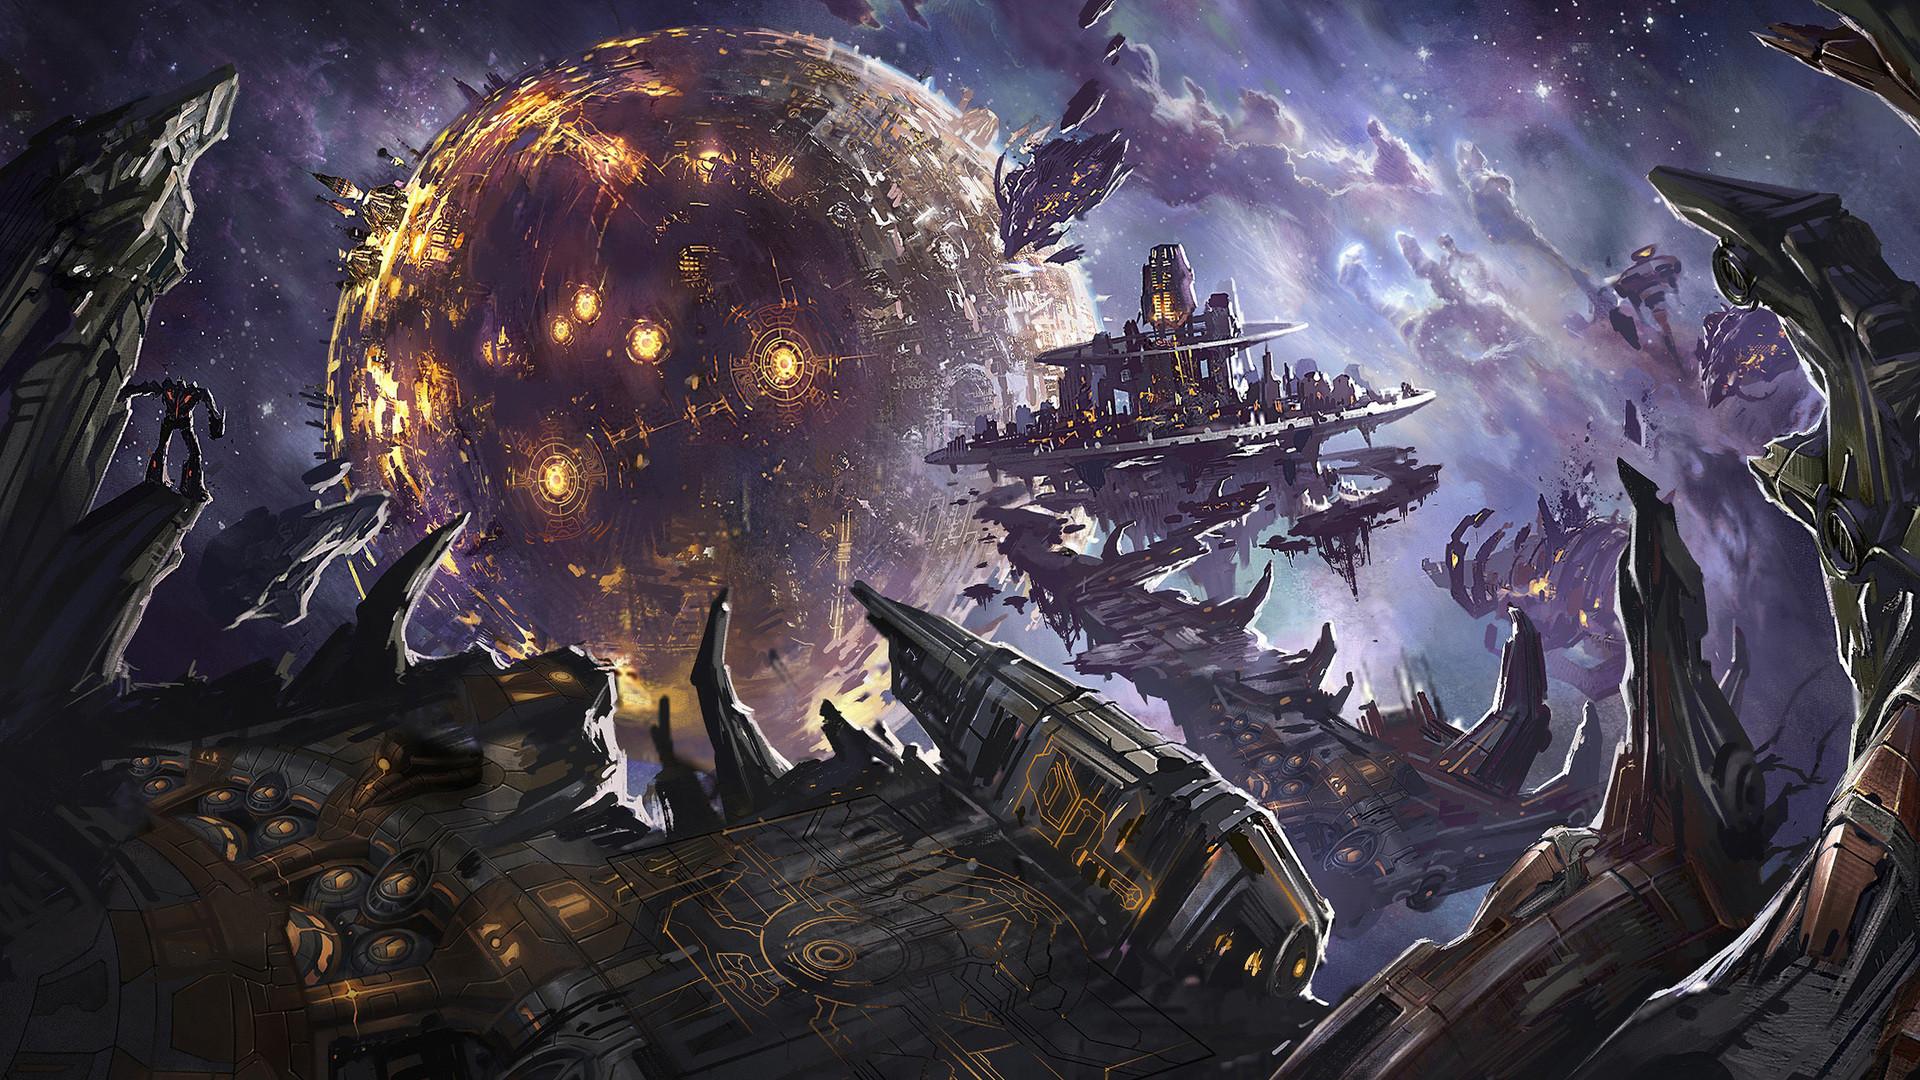 Sci Fi Spaceship Wallpaper #493029 – Resolution px